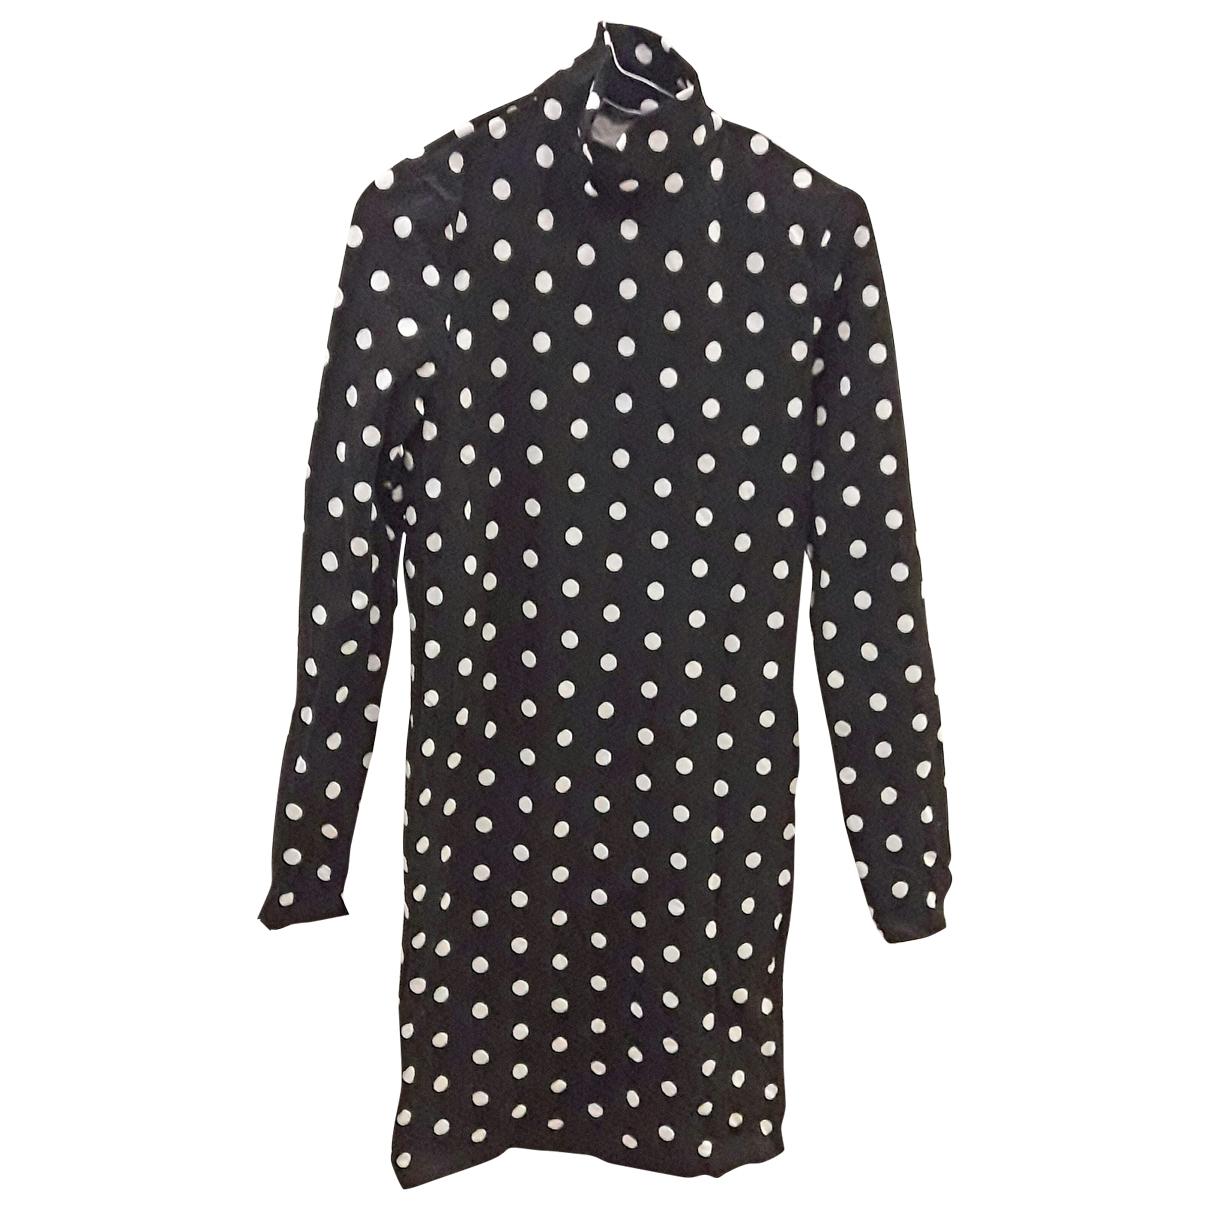 Wolford \N Black dress for Women M International